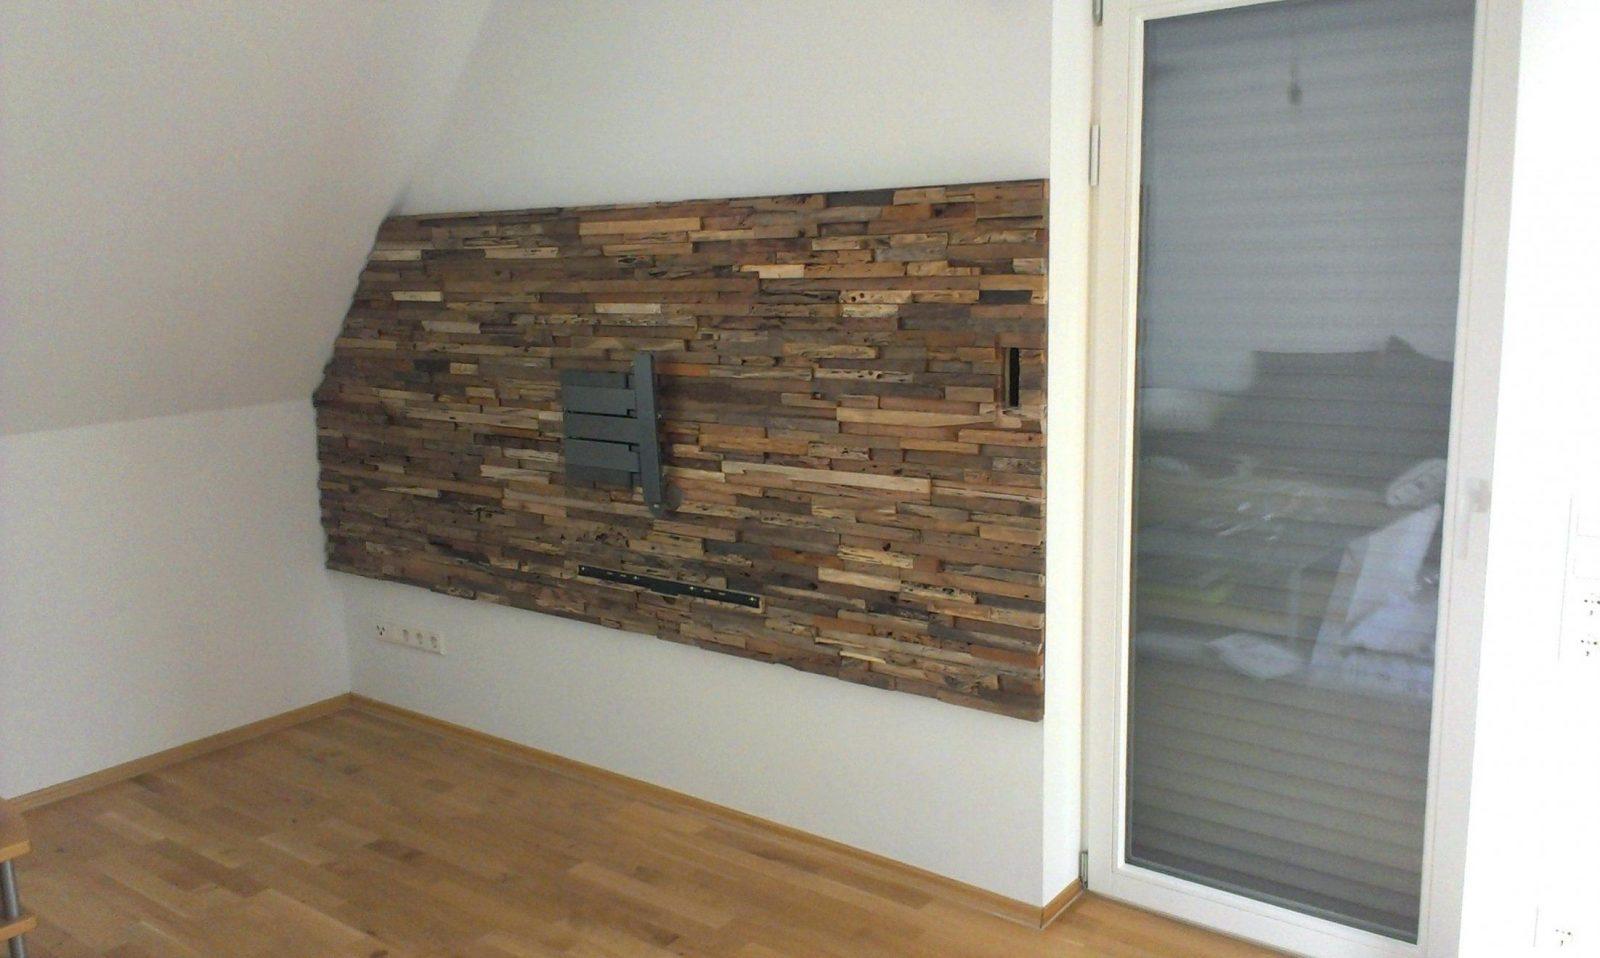 Wandverkleidung Holz Selber Bauen Wandverkleidungen Granit von Wandvertäfelung Holz Selber Machen Photo